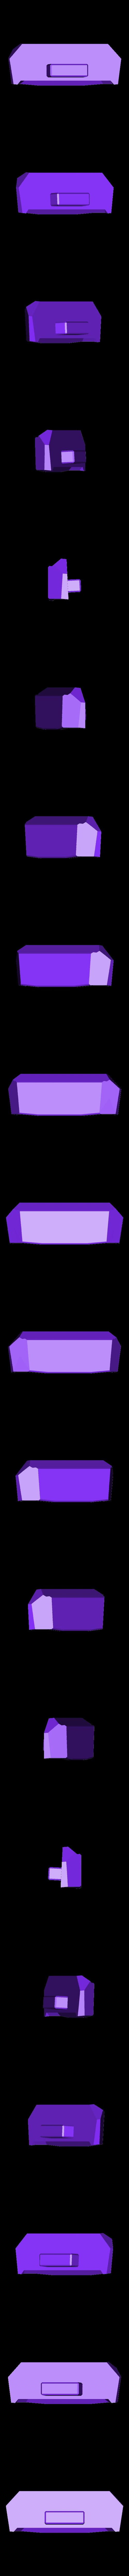 7_Drag_Head7_Neck2Front_GREEN.stl Download STL file ARTICULATED DRAGONLORD (not Dragonzord) - NO SUPPORT • 3D printer model, Toymakr3D